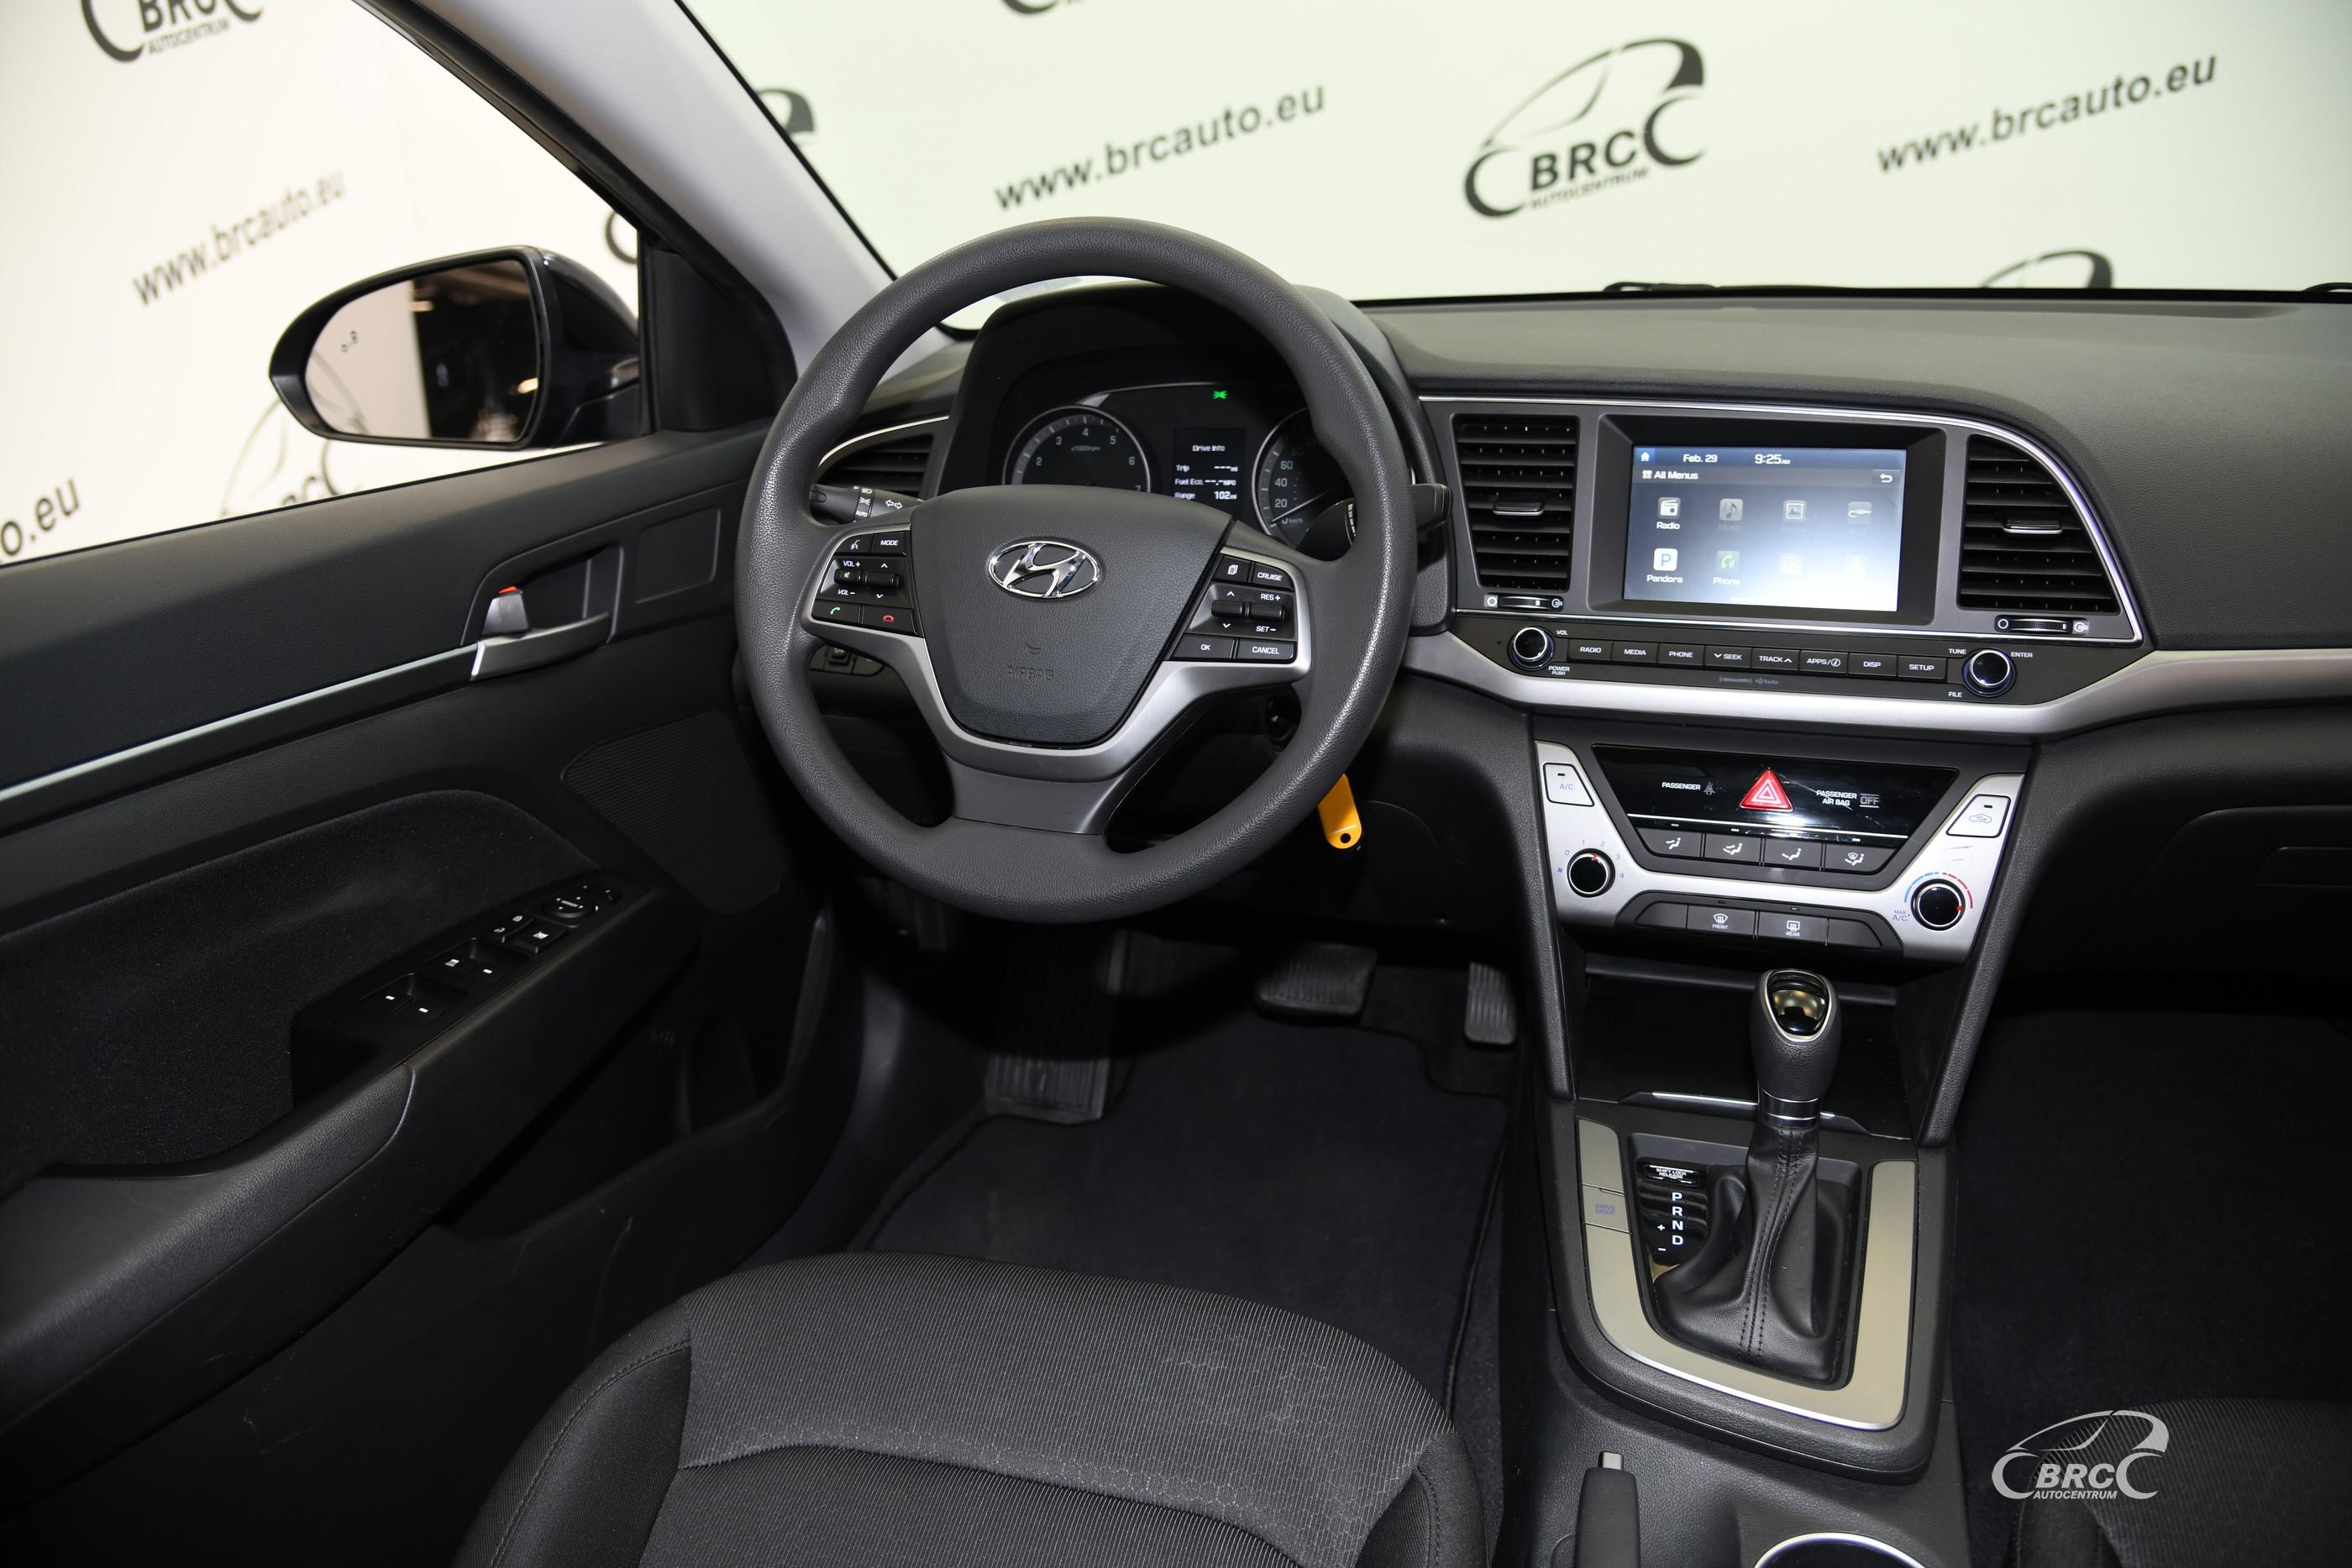 Hyundai Elantra 2.0i MPI Automatas